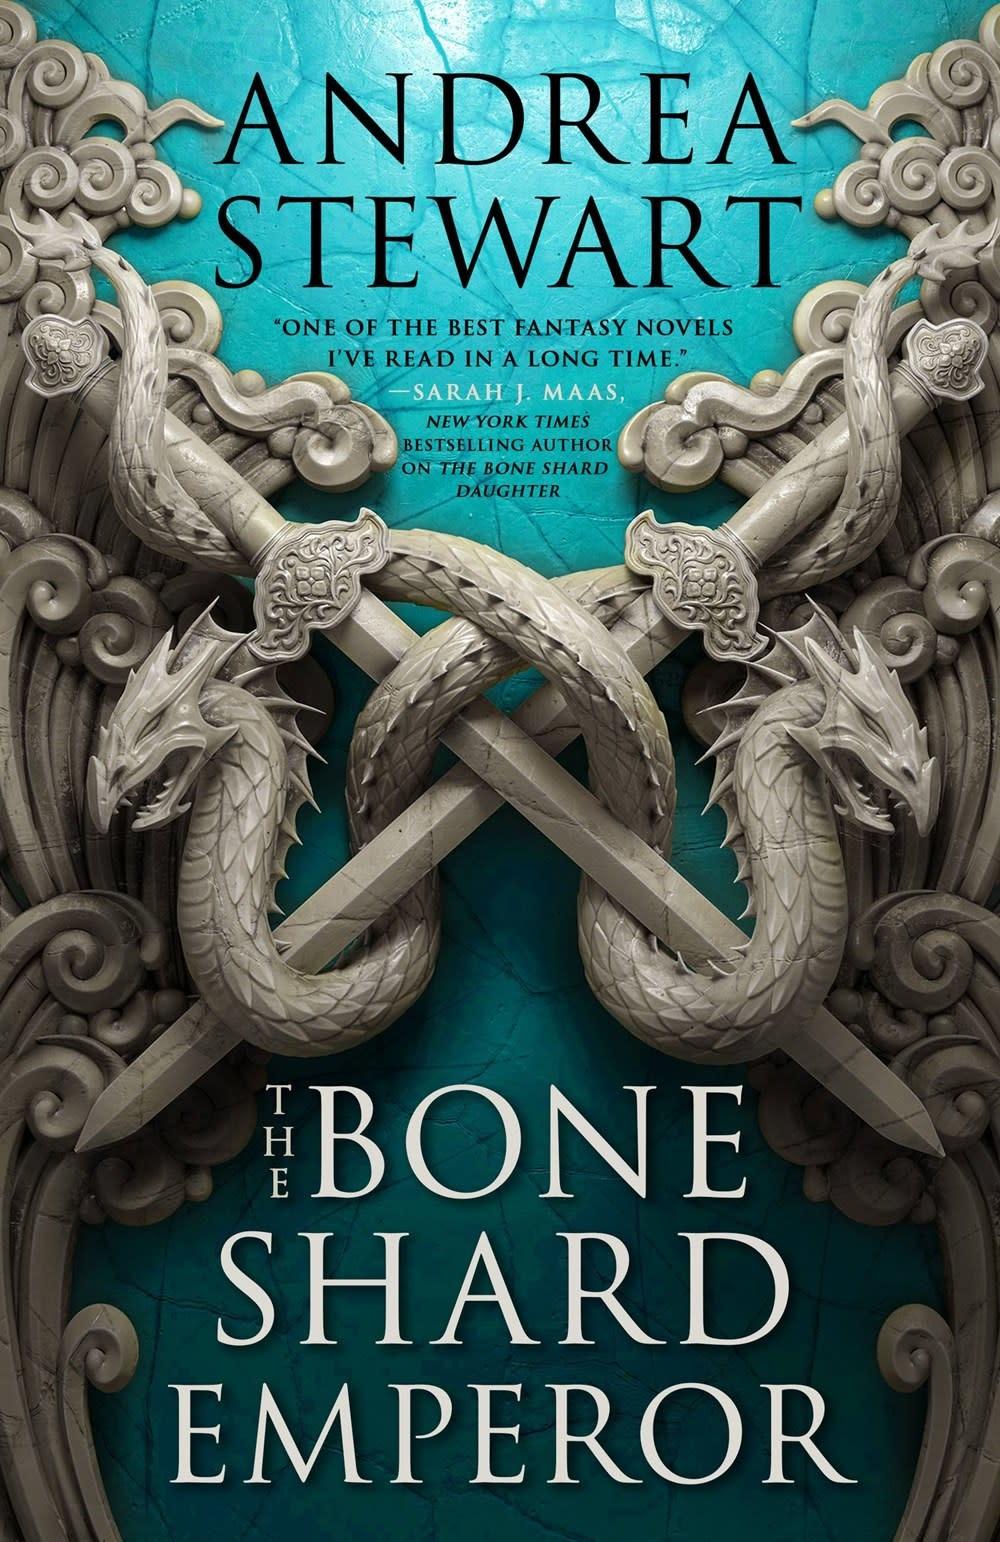 Orbit The Drowning Empire #2 The Bone Shard Emperor